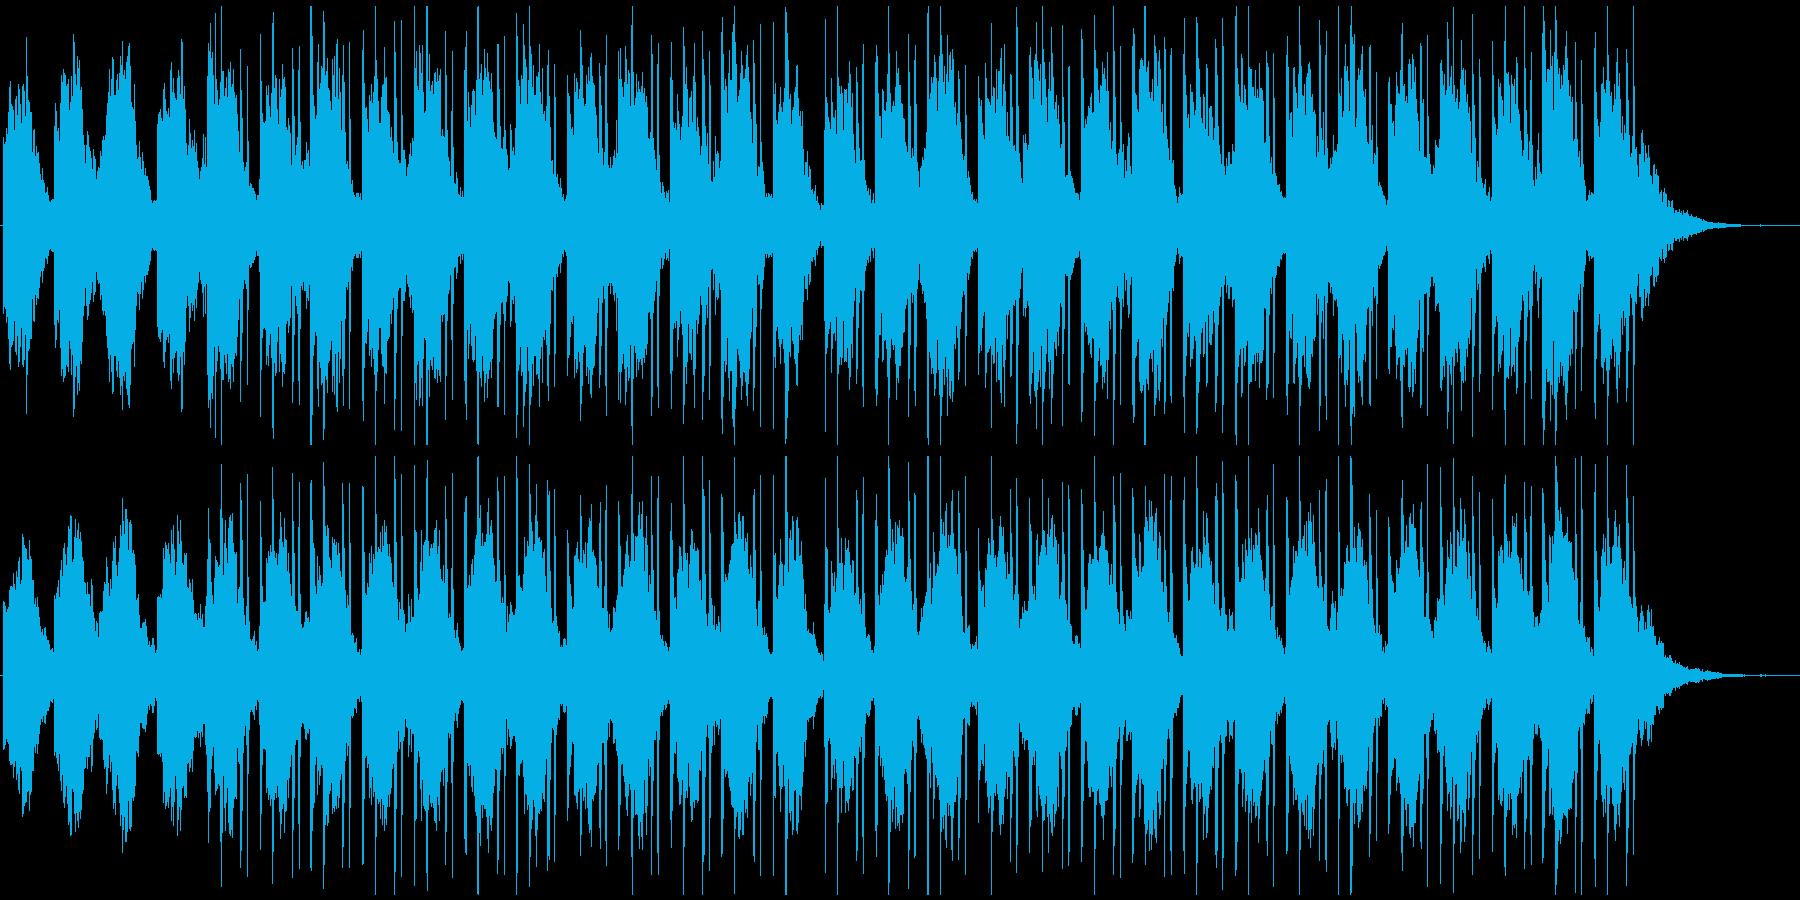 【LOFI HIPHOP】深夜勉強用Bの再生済みの波形